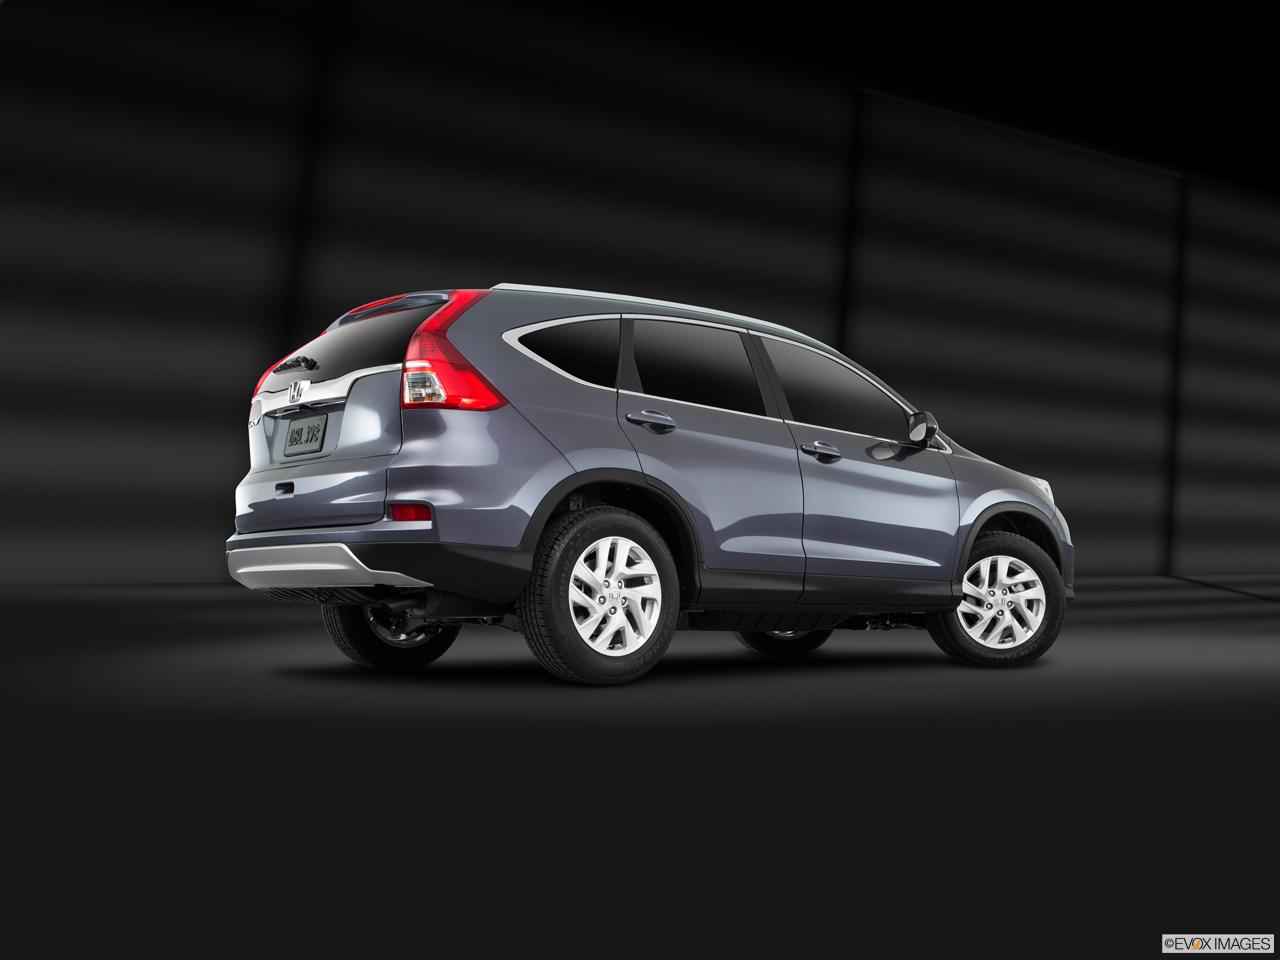 Honda dealer hampton roads casey honda newport news for Honda dealerships in va